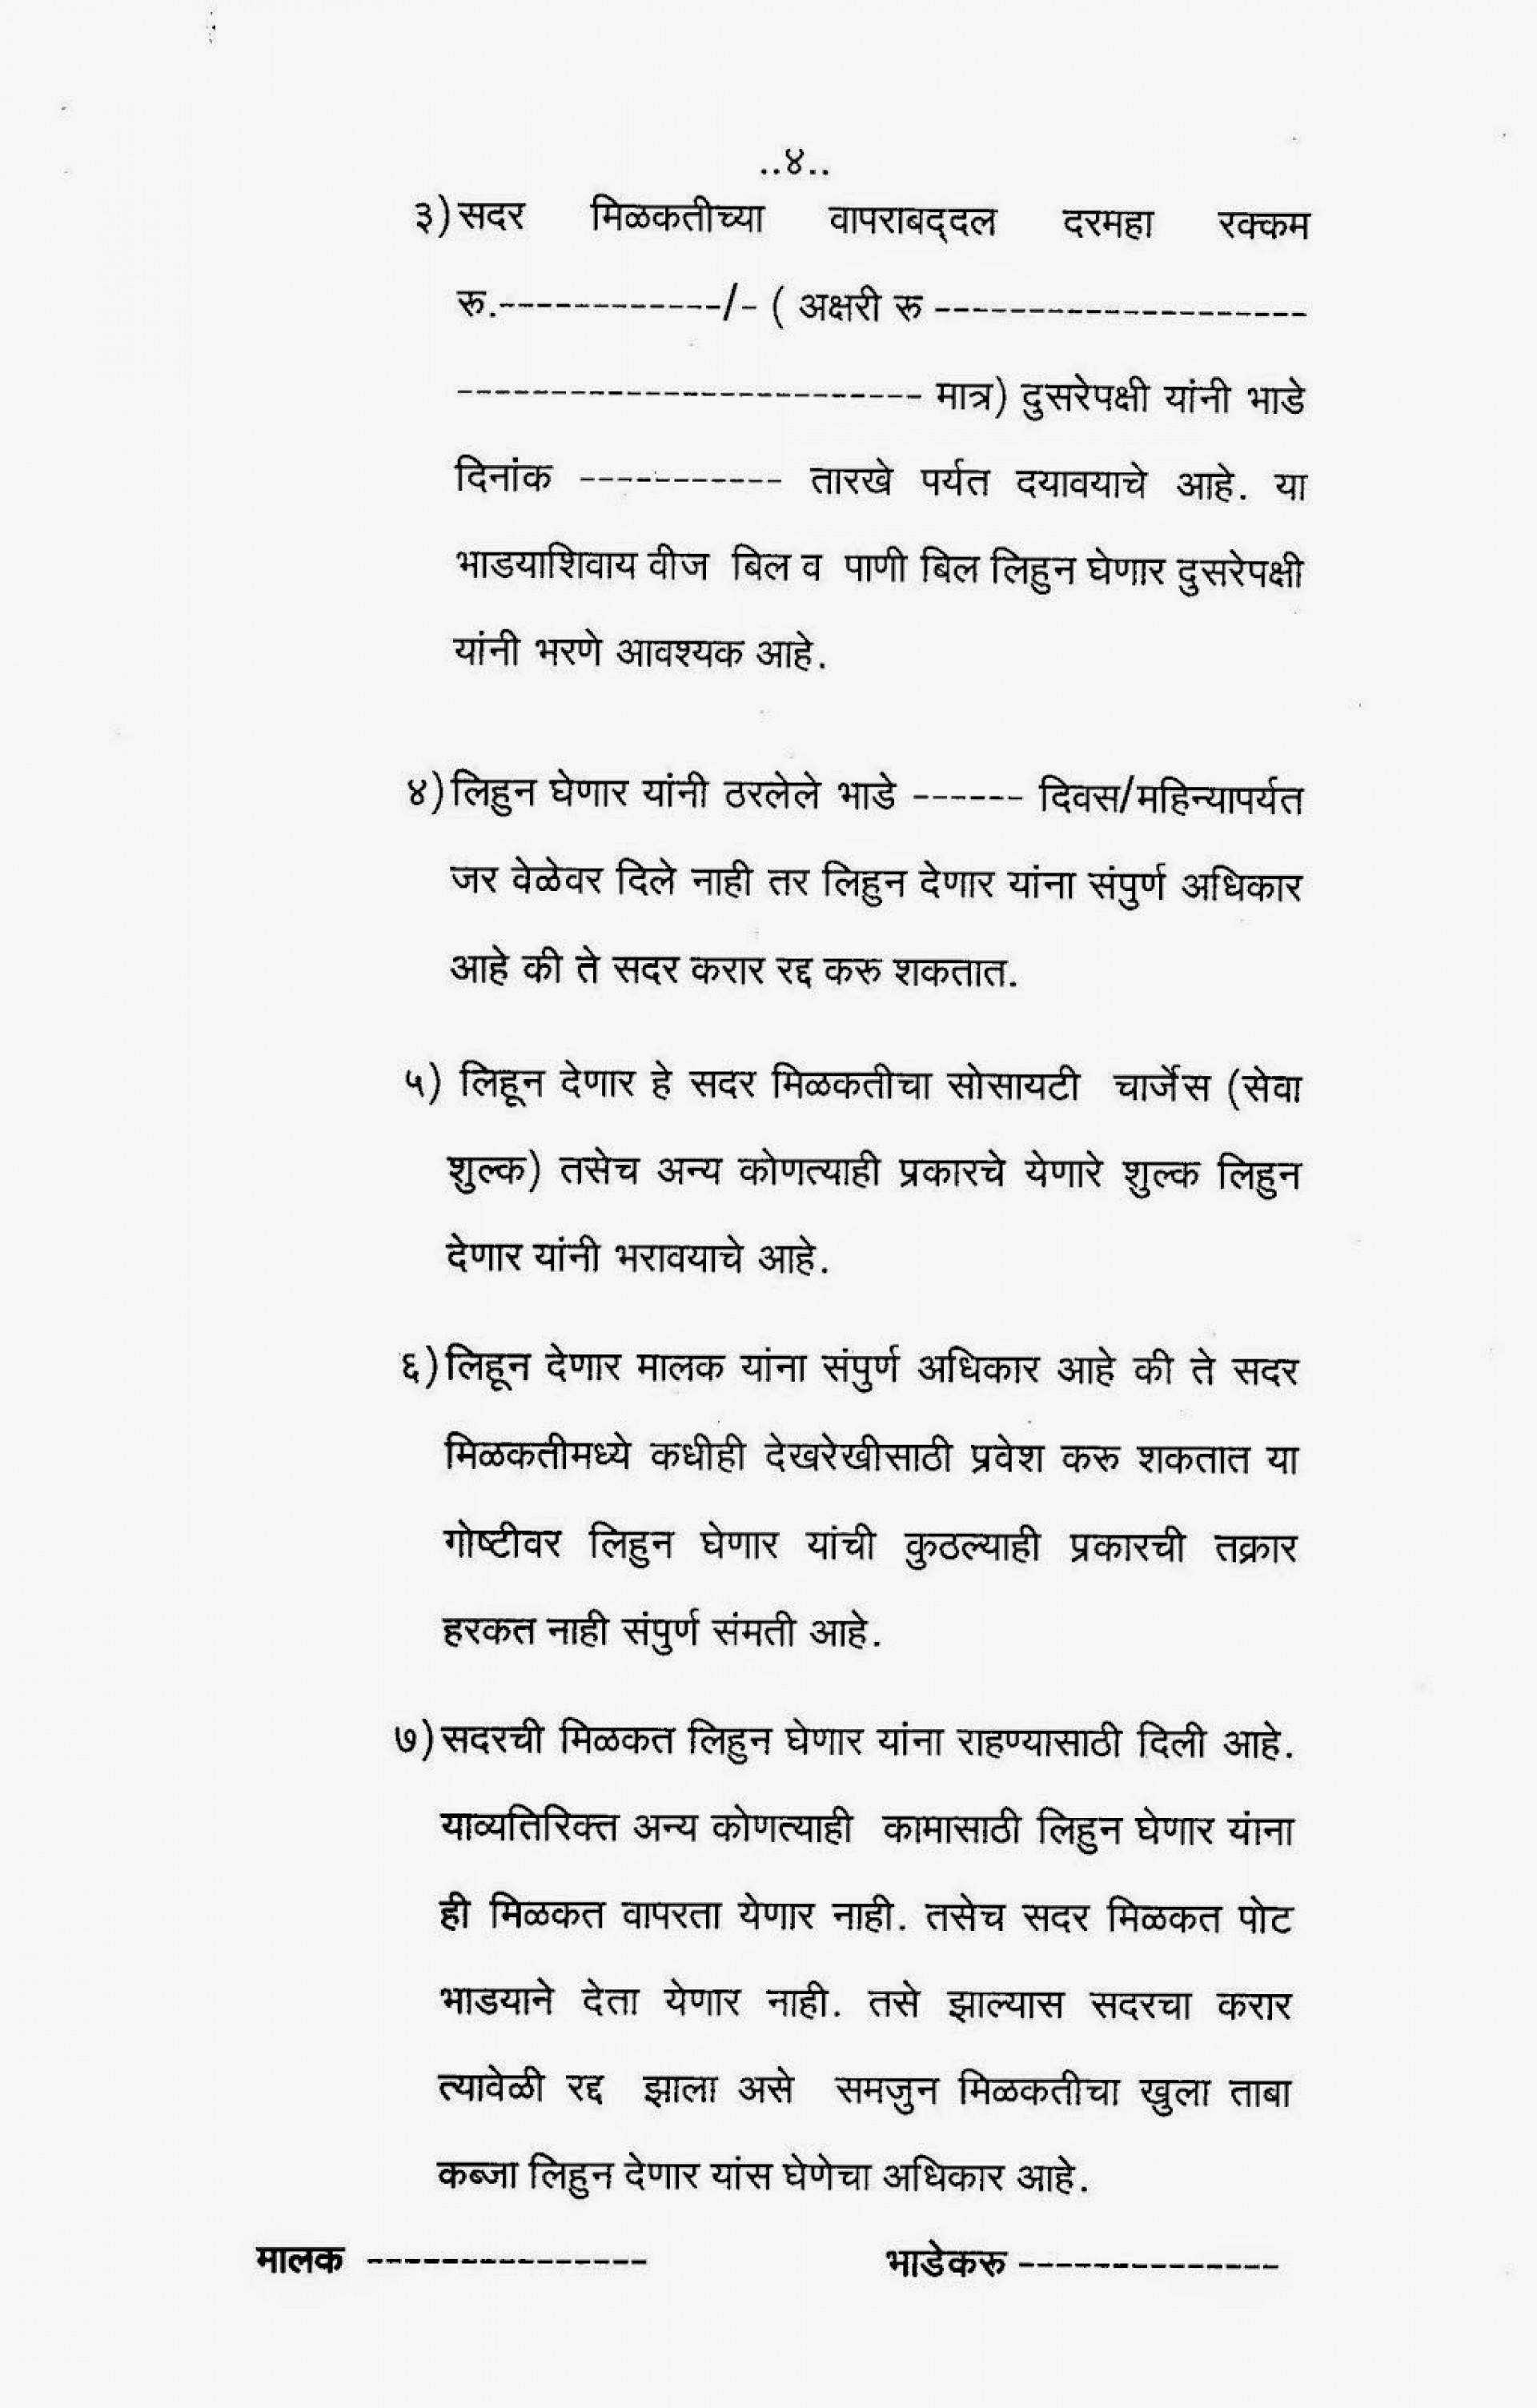 007 Wondrou Room Rent Agreement Format In Hindi Pdf Photo 1920